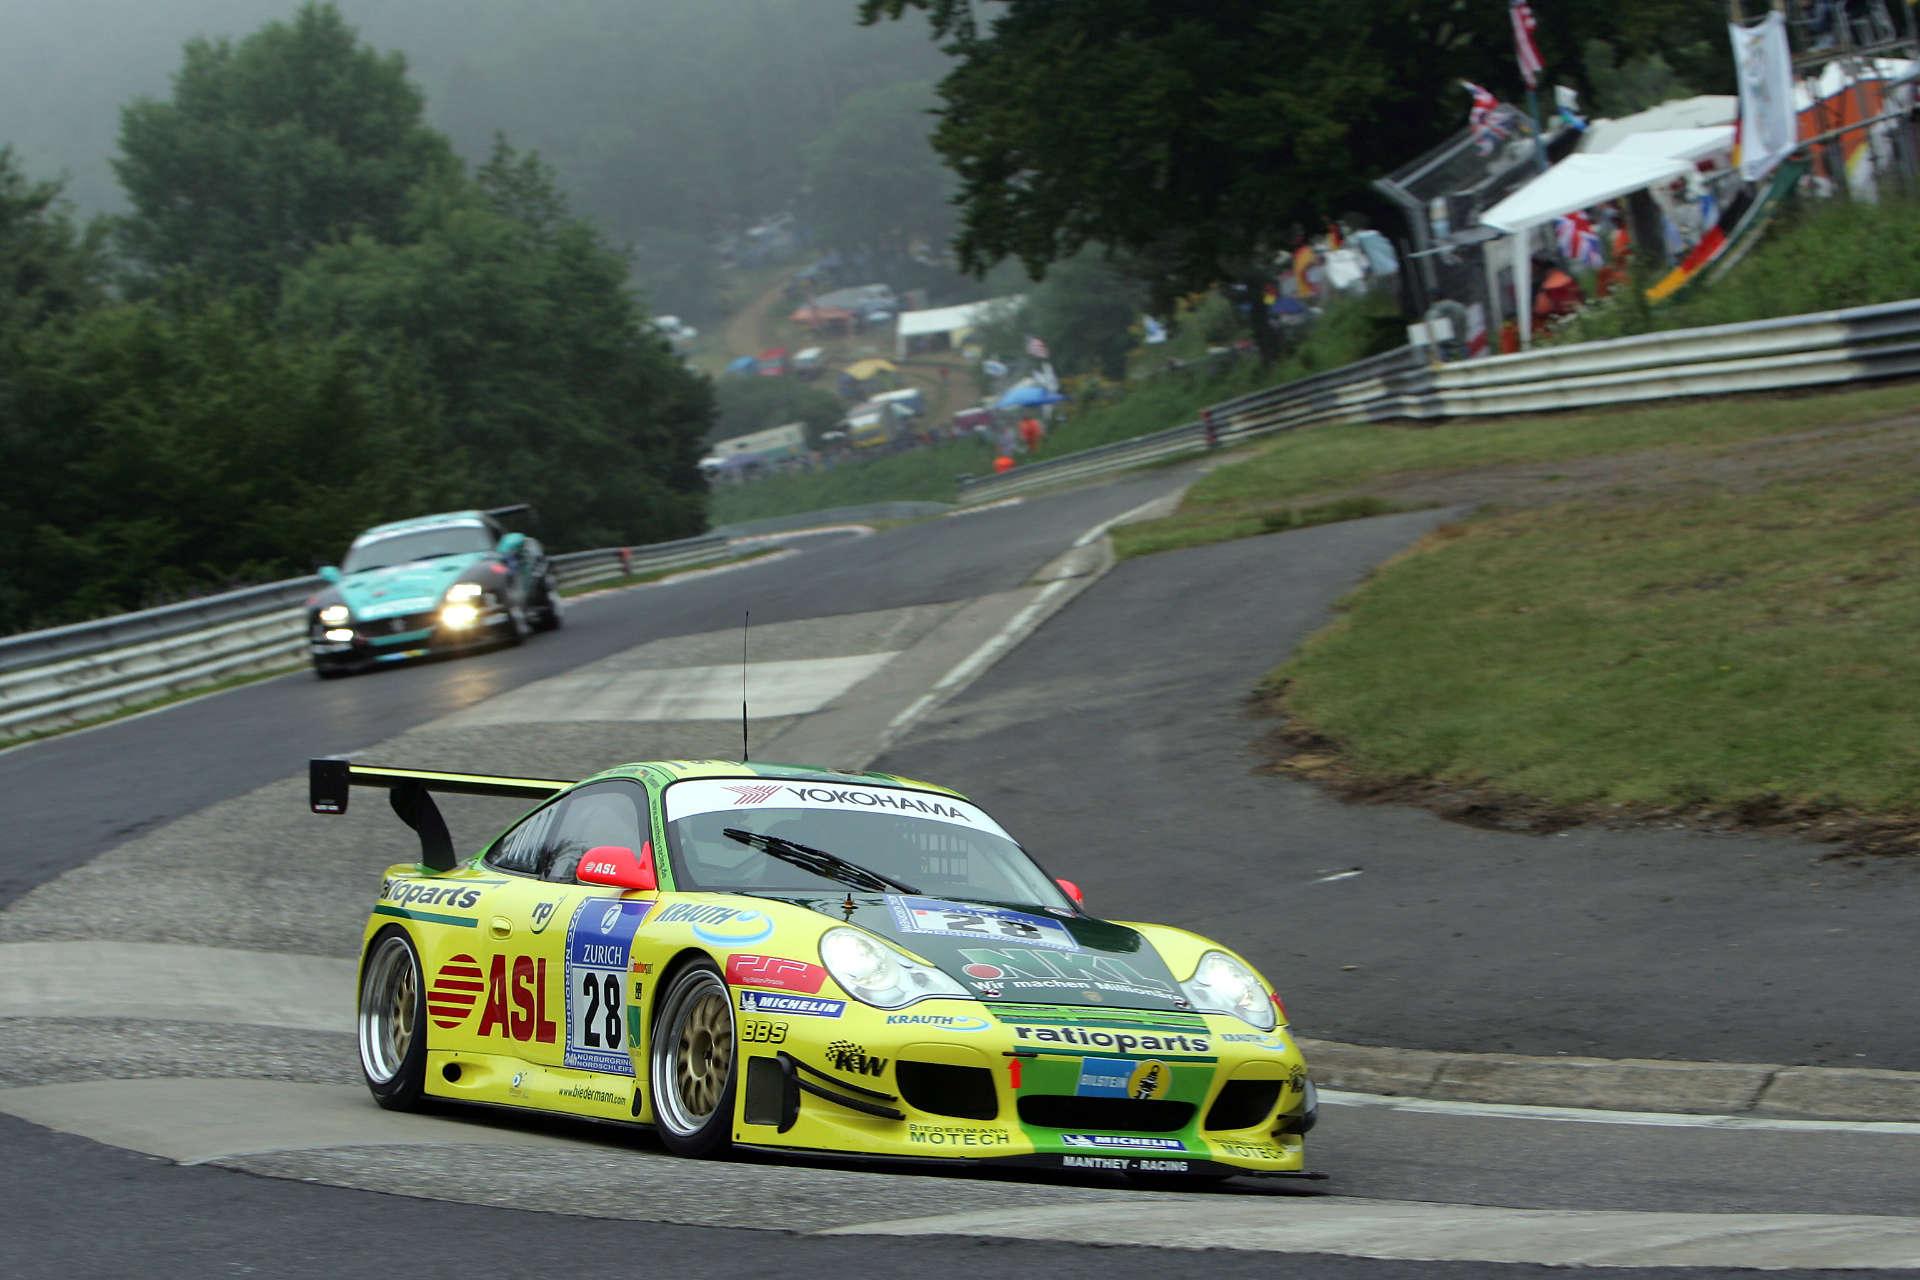 Nürburgring 24-Stunden-Rennen 2006